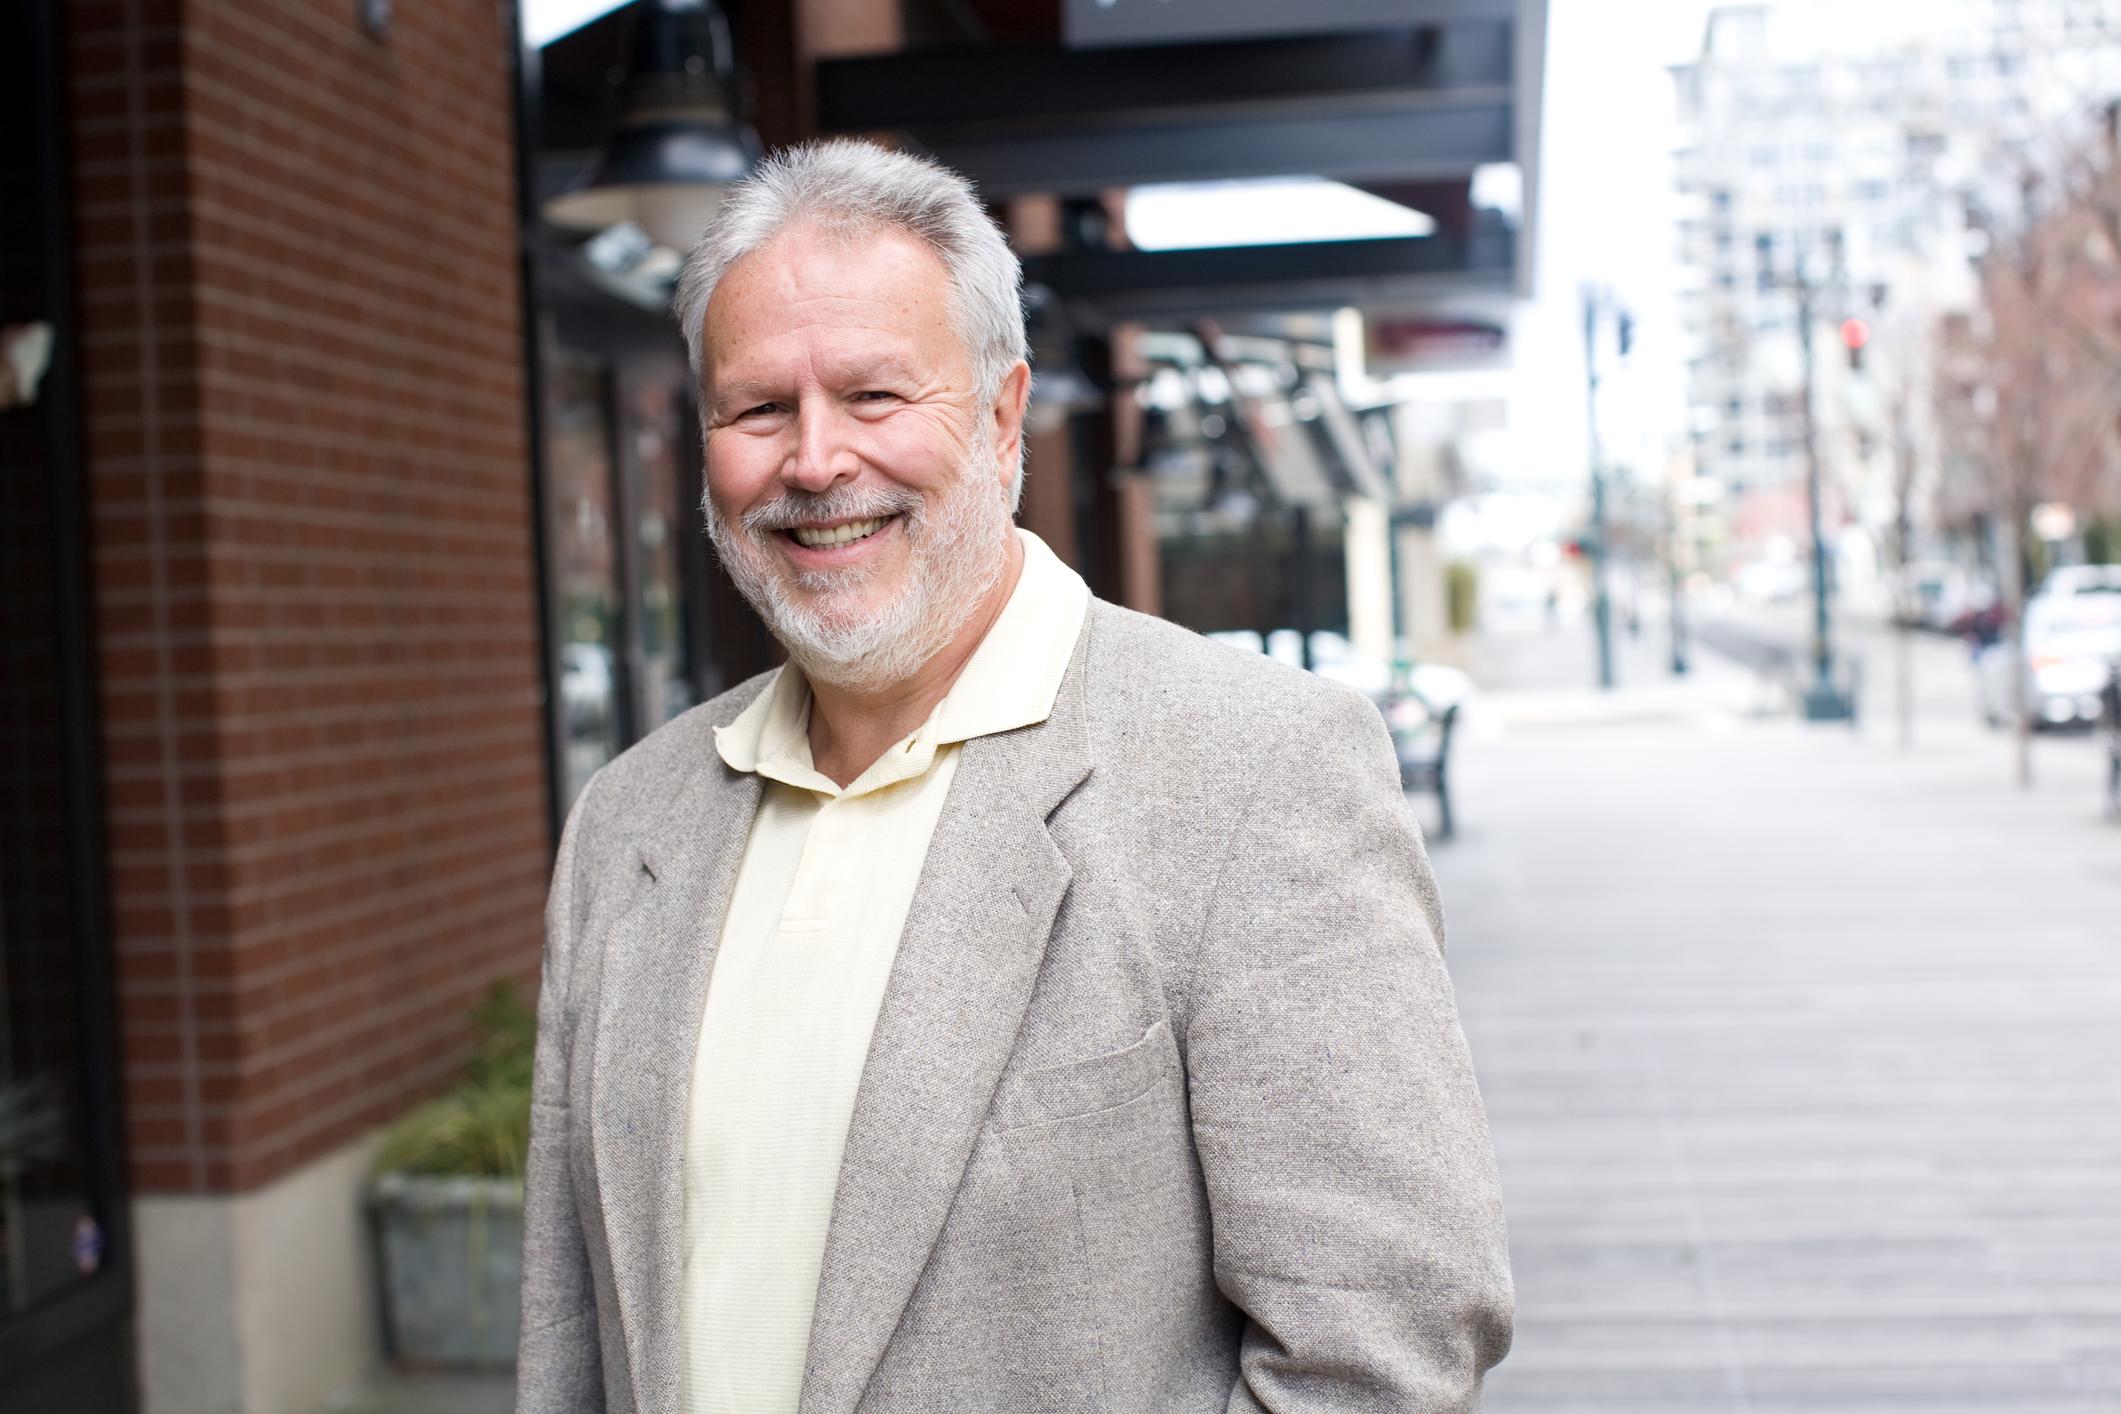 A smiling senior man on the street.